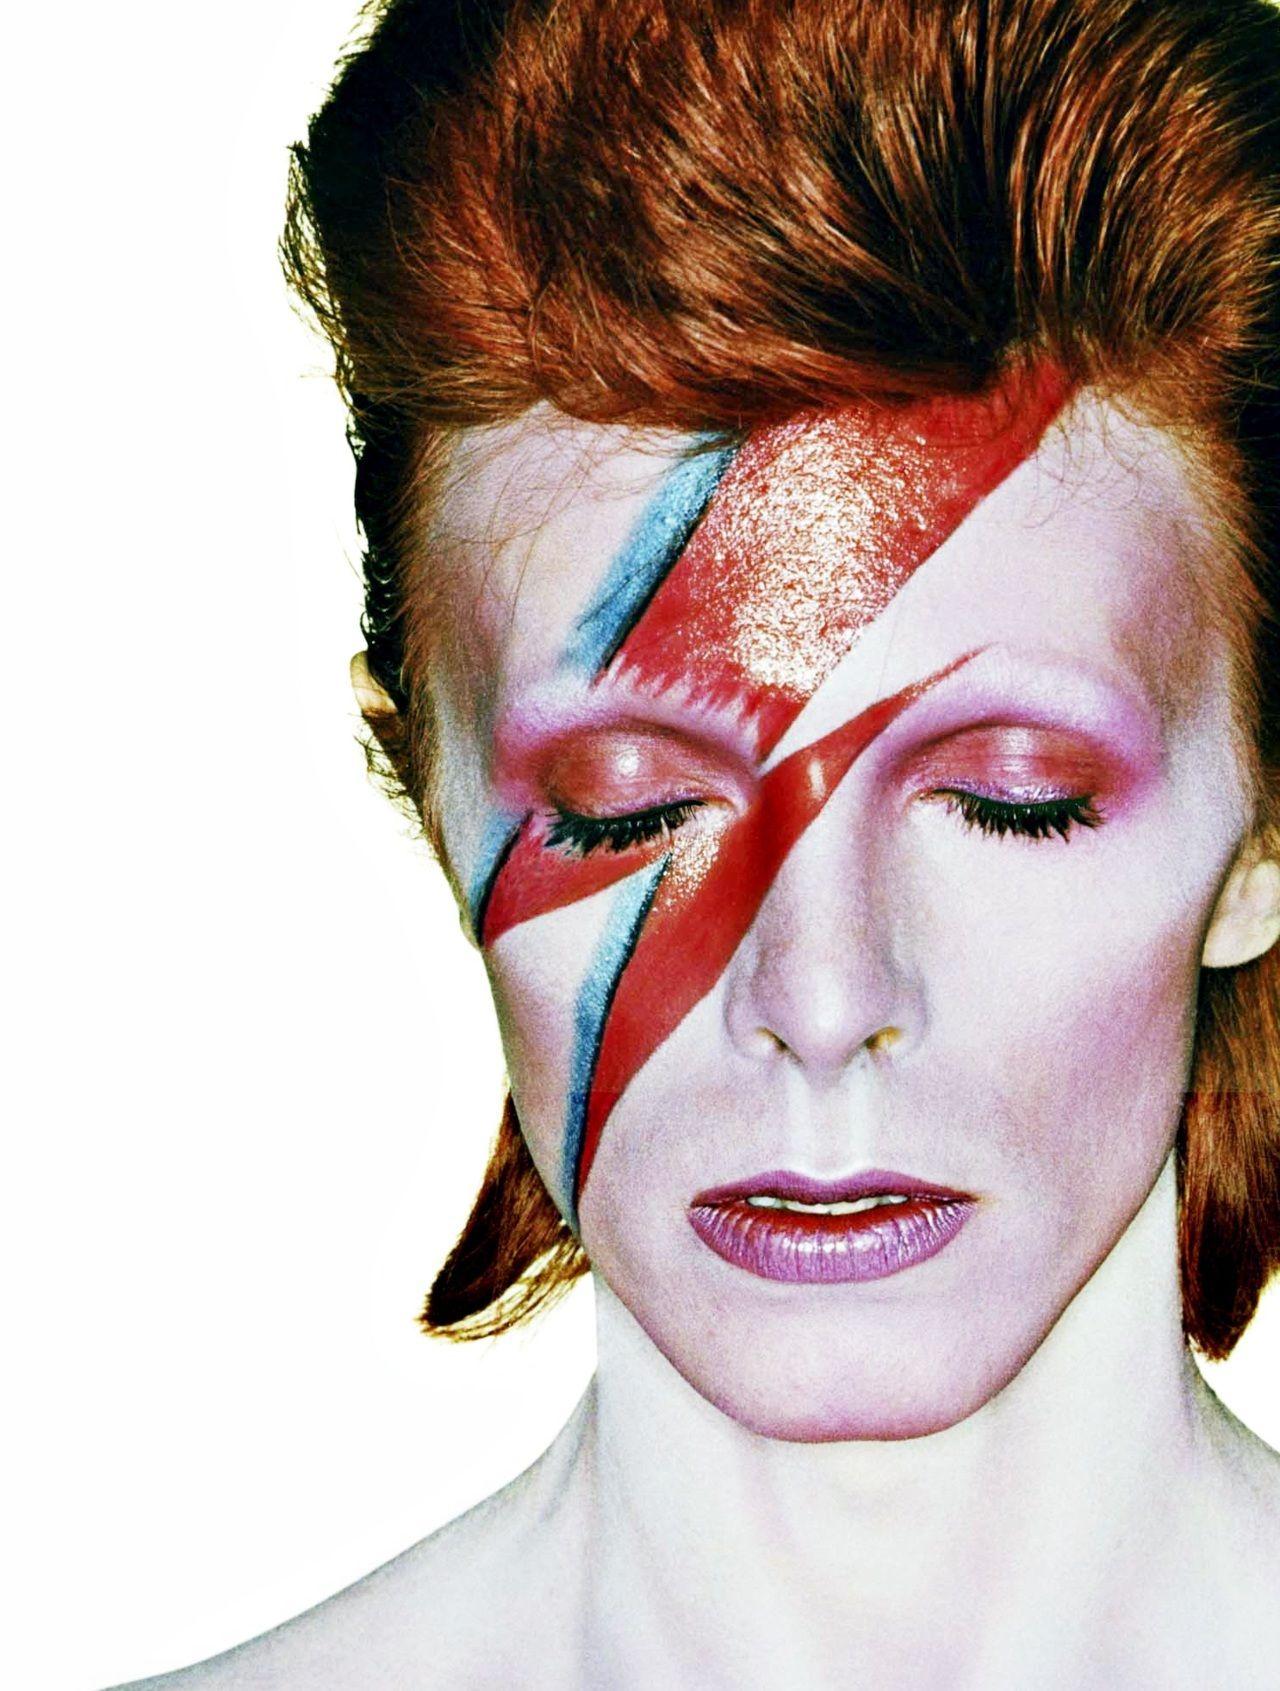 Ziggy Stardust David Bowie Costume David Bowie Makeup David Bowie Ziggy Stardust